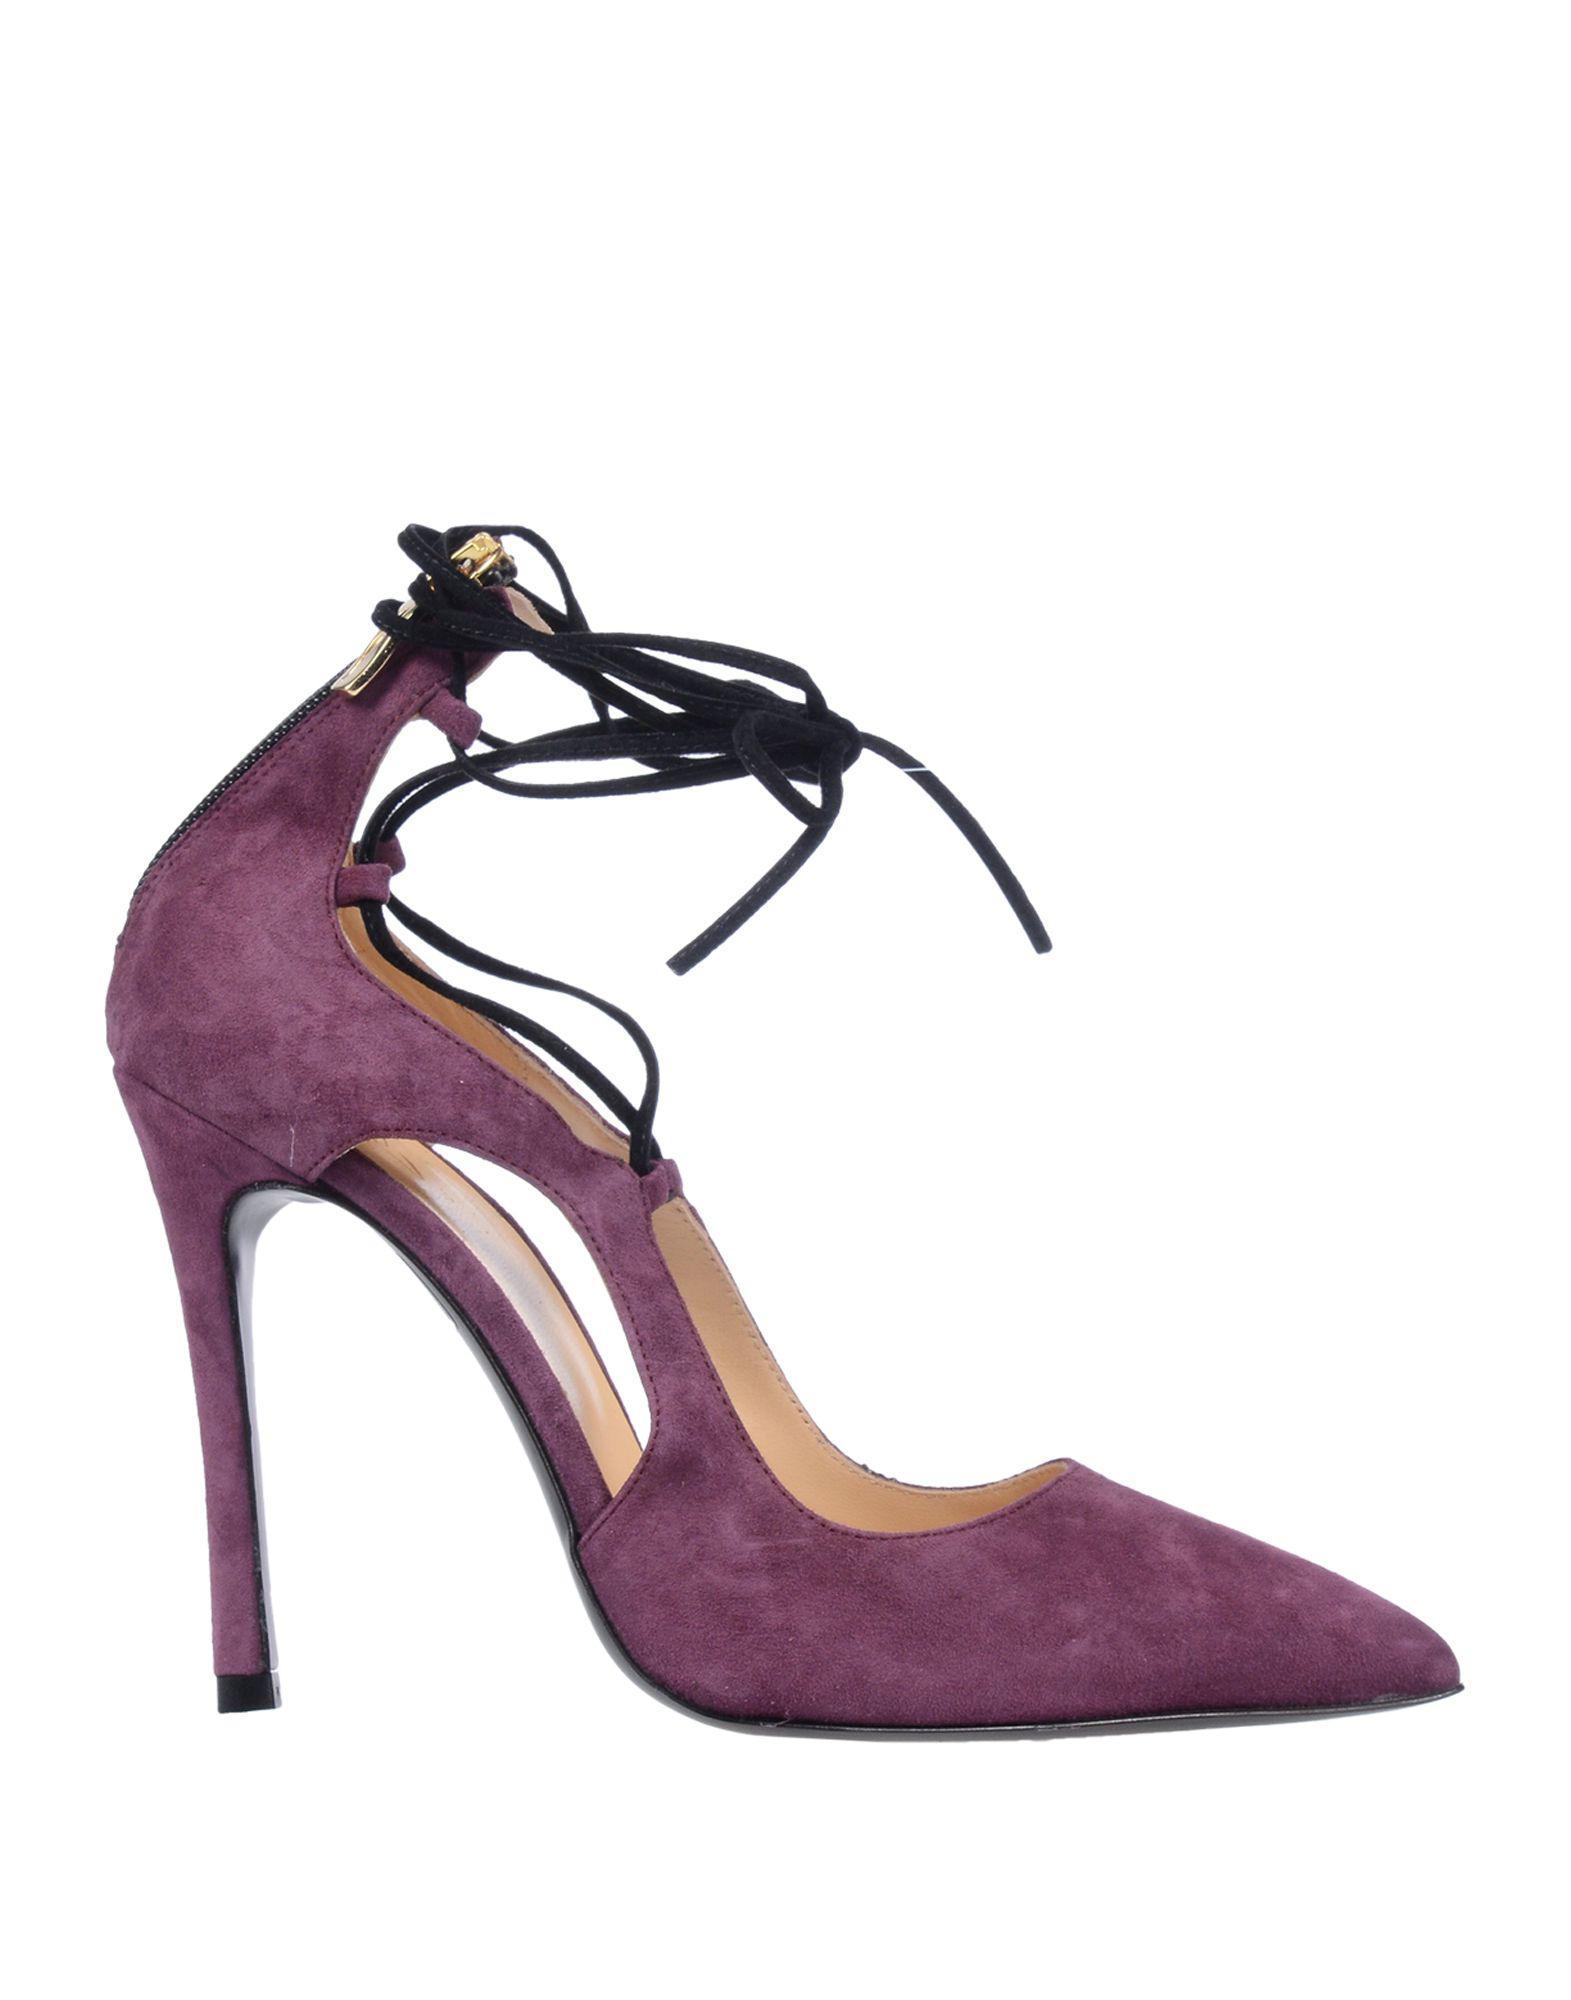 c37d10e76db salón Lyst color Morado de Zapatos de Icône IYE2H9WD